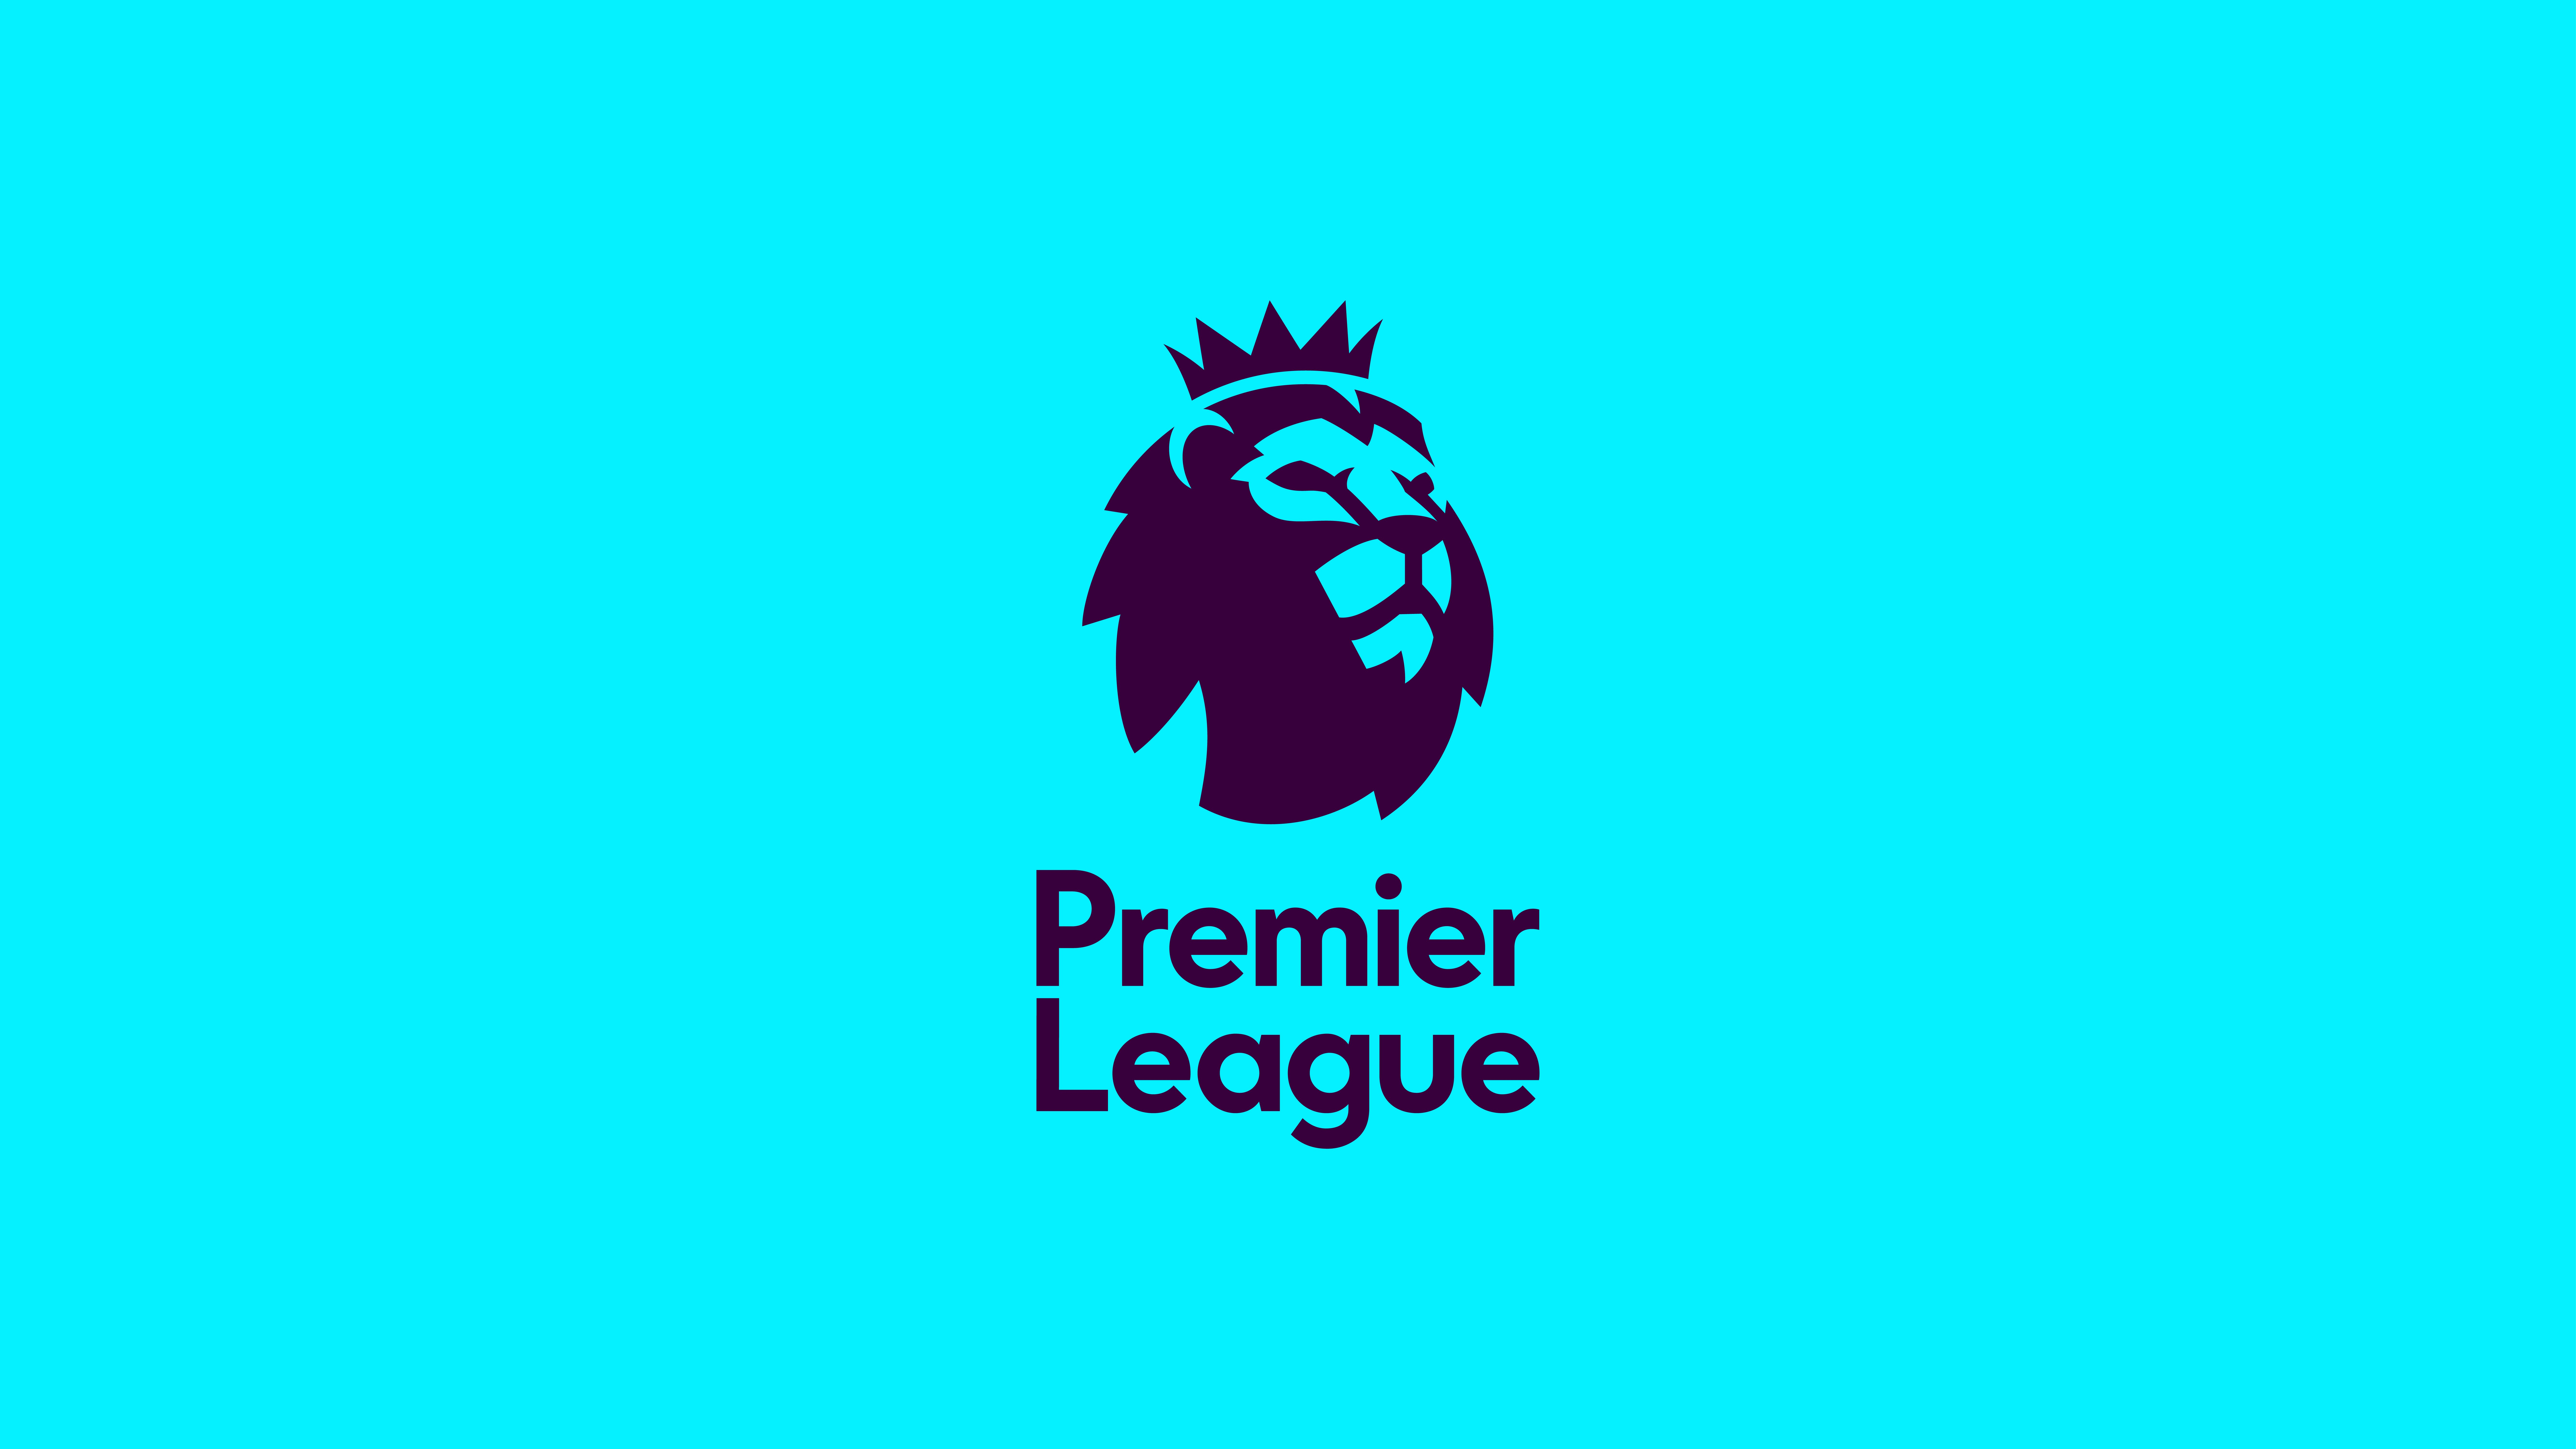 Premier League Rebrand 2018